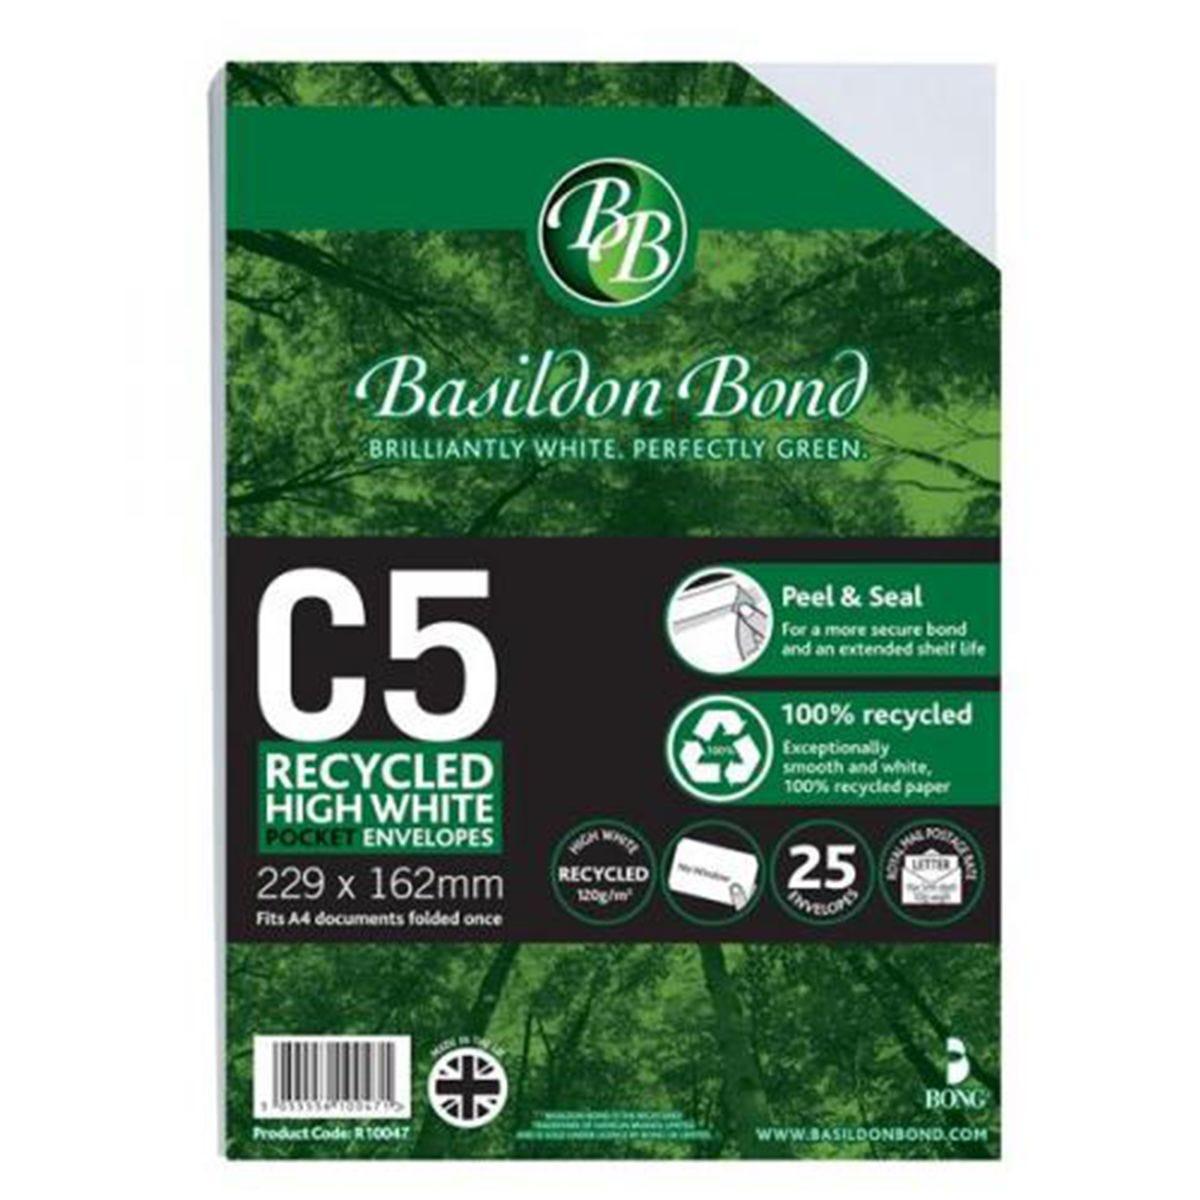 Basildon Bond C5 Peel and Seal 120g/m2 Plain Recycled Business White Envelopes - Pack of 25